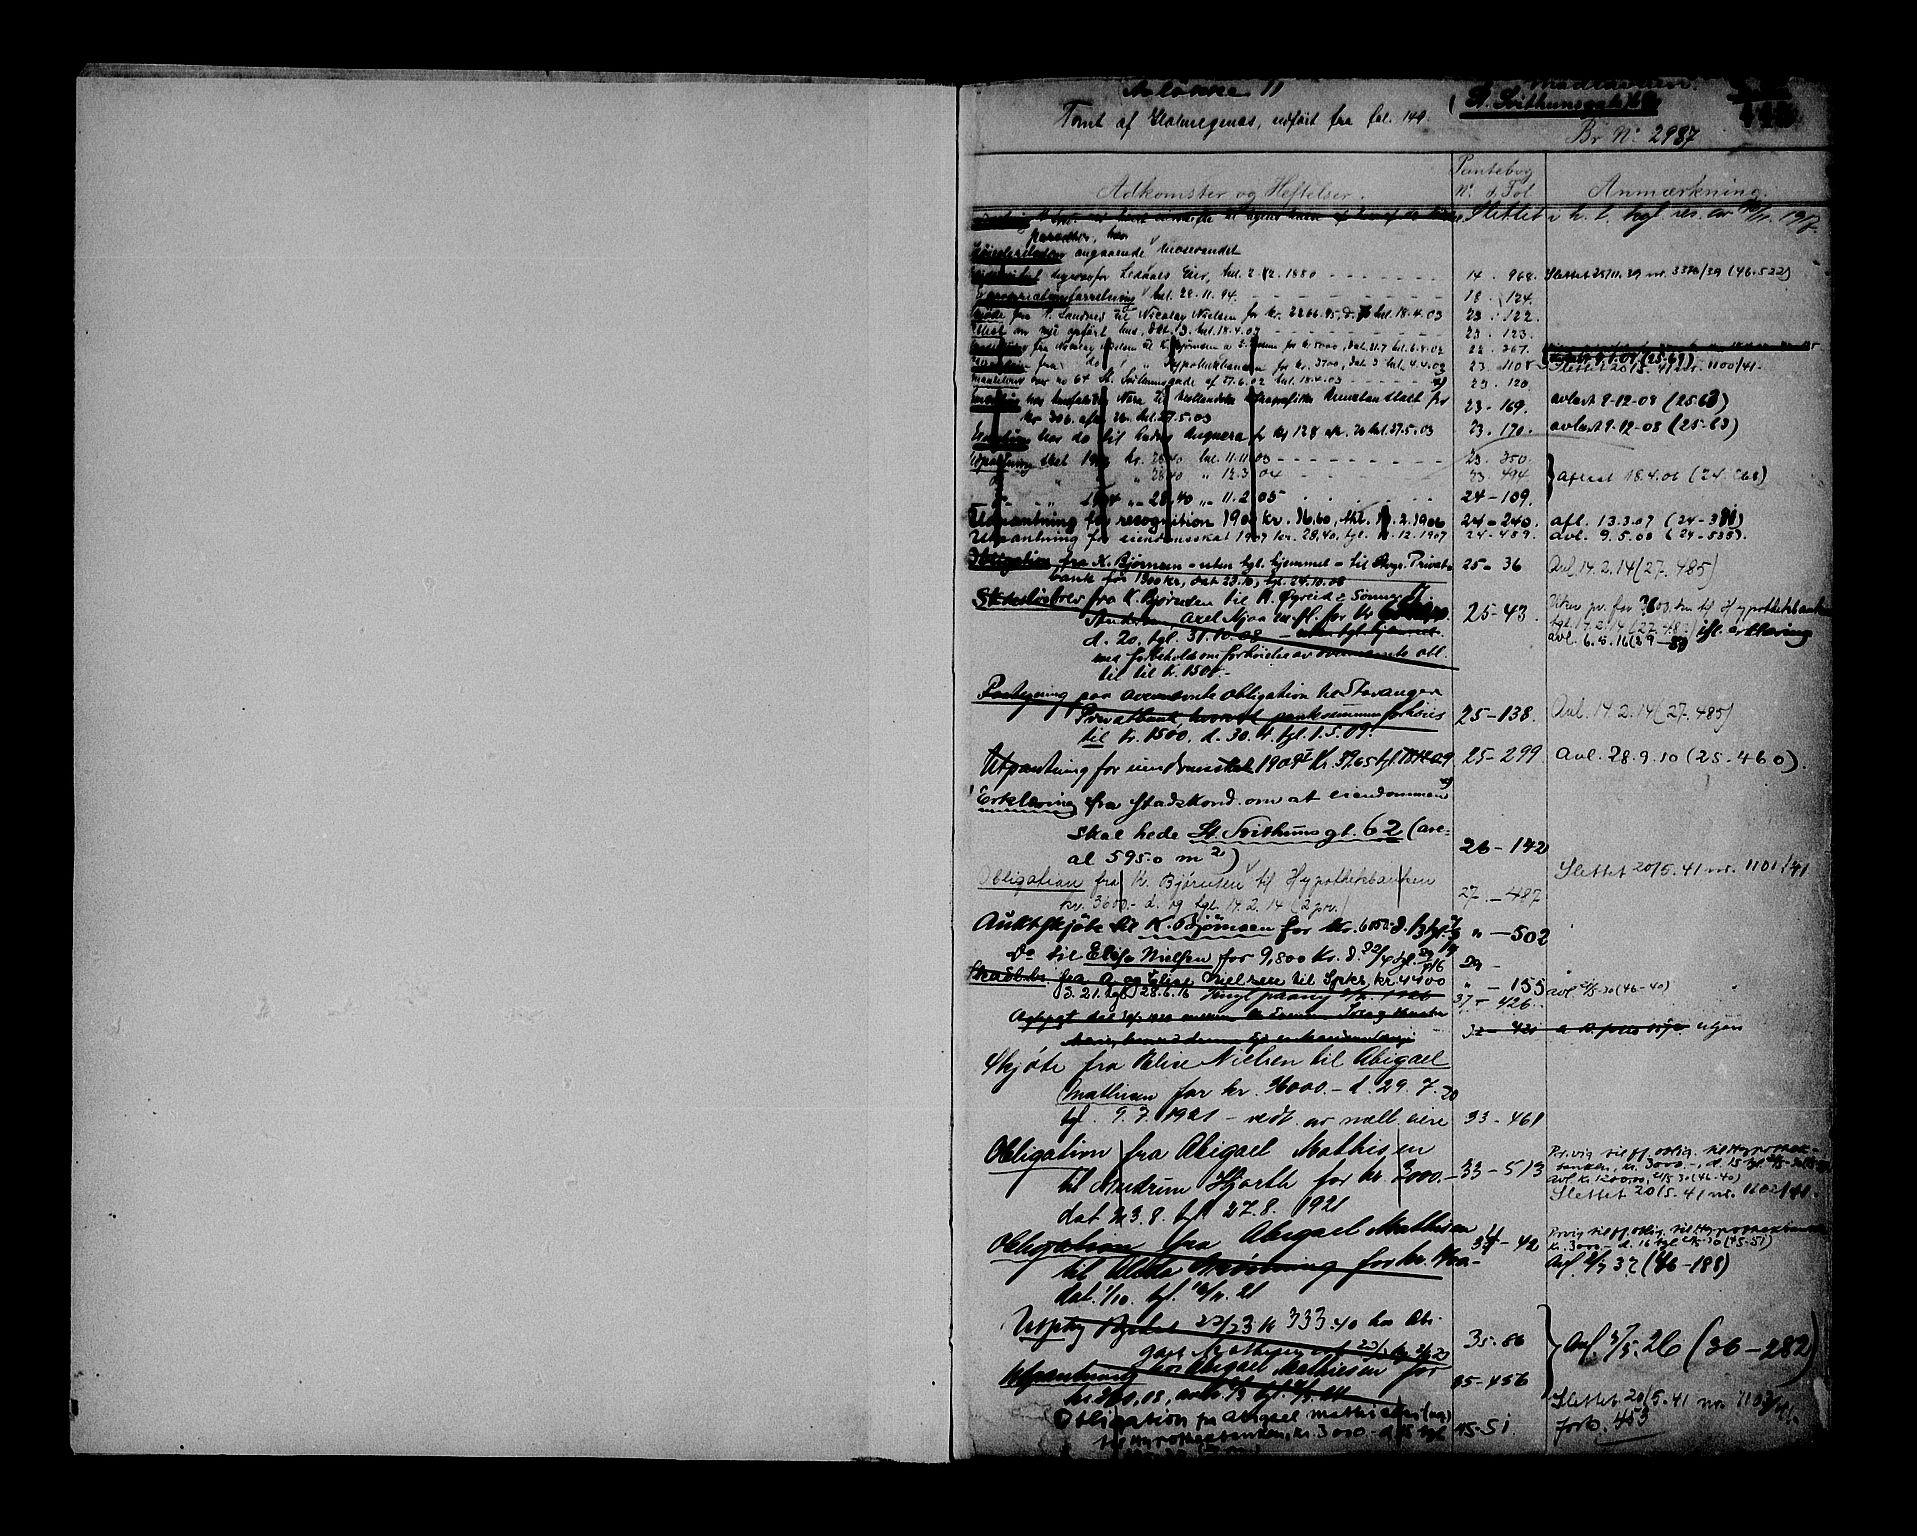 SAST, Stavanger byfogd, 4/41/410/410AD/L0009B: Mortgage register no. AD 9B, 1879, p. 445